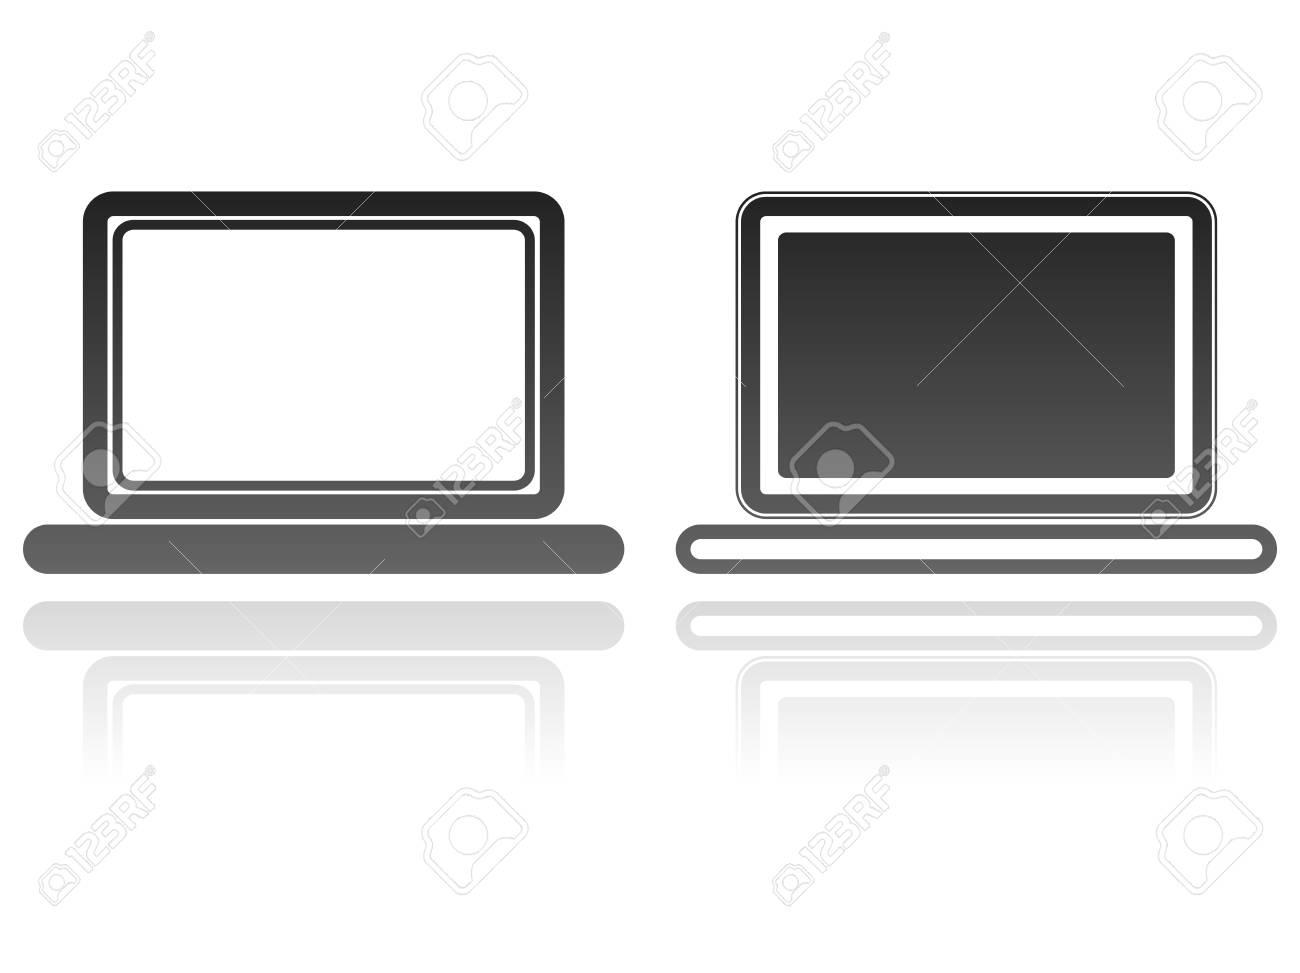 laptop icon Stock Vector - 13009268